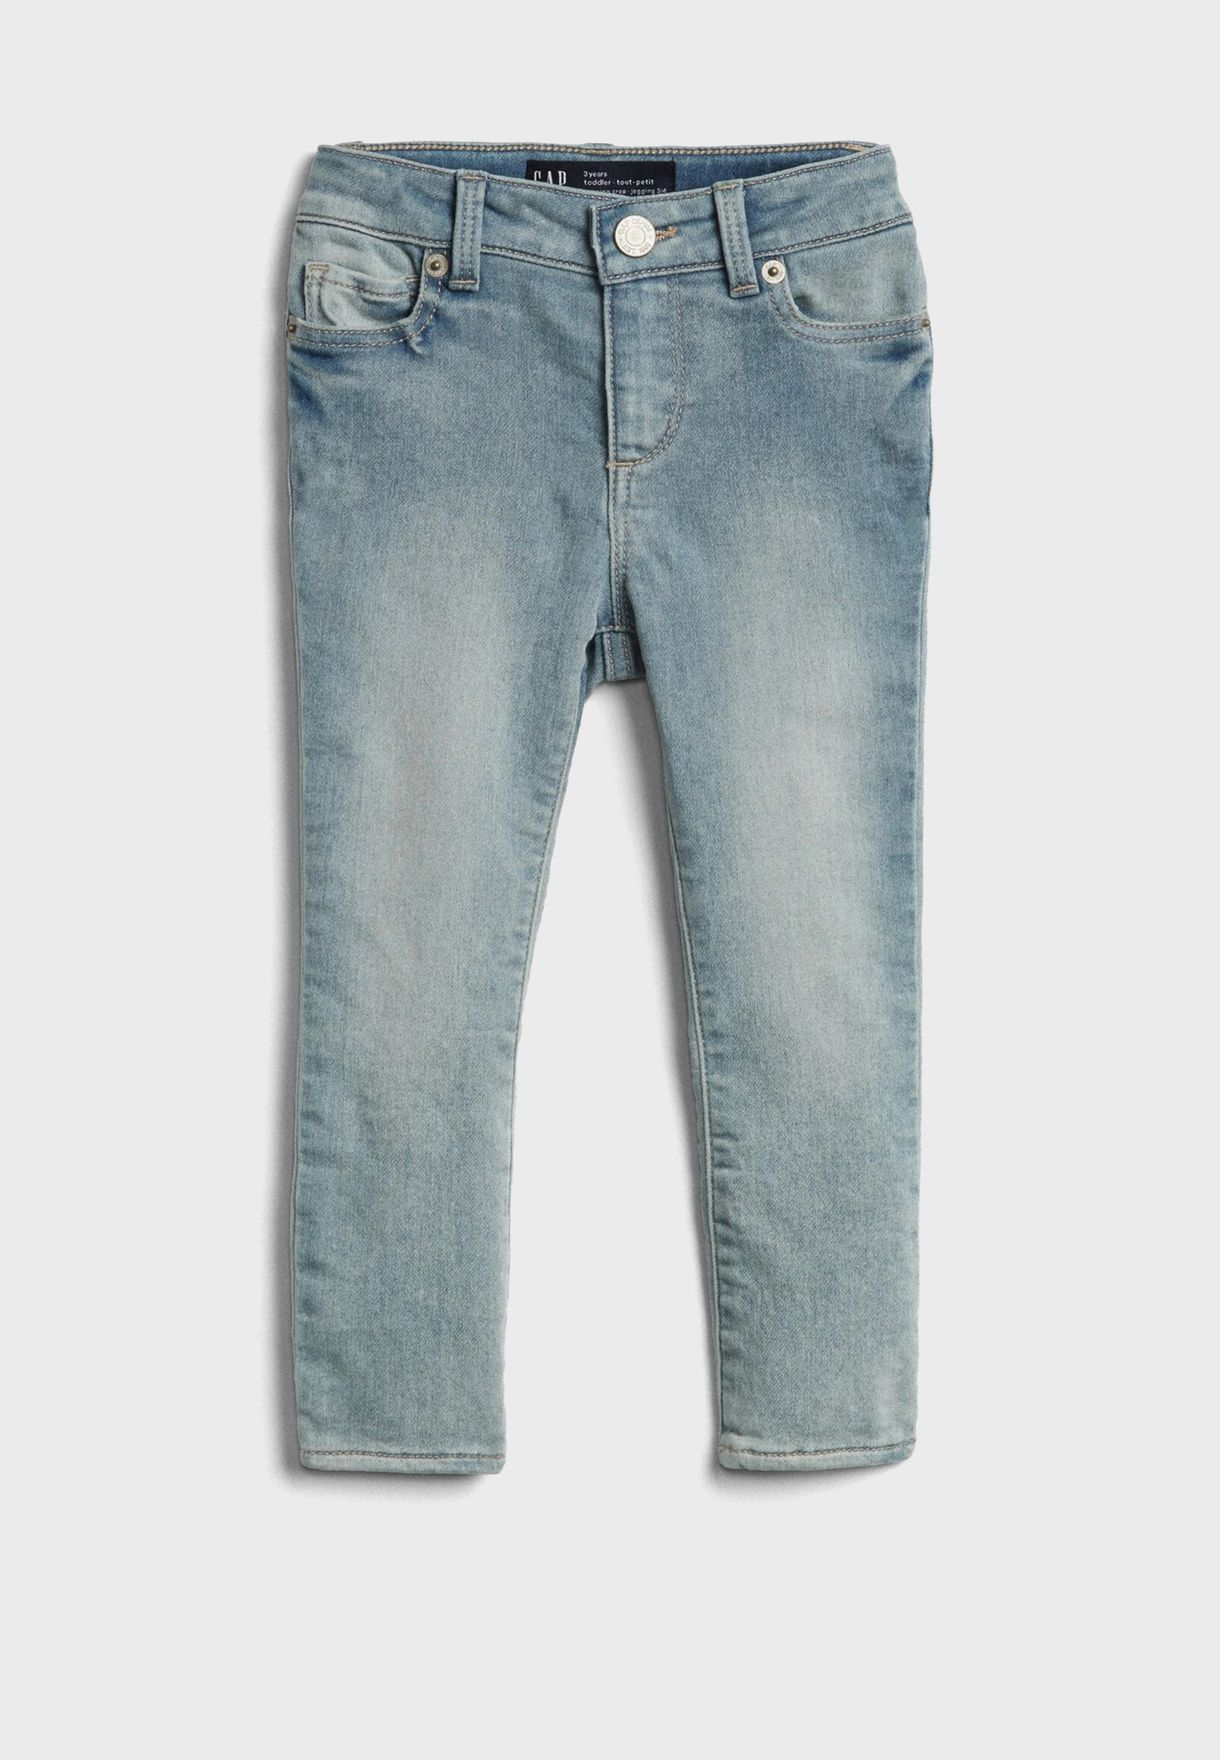 Kids Distressed Jeans